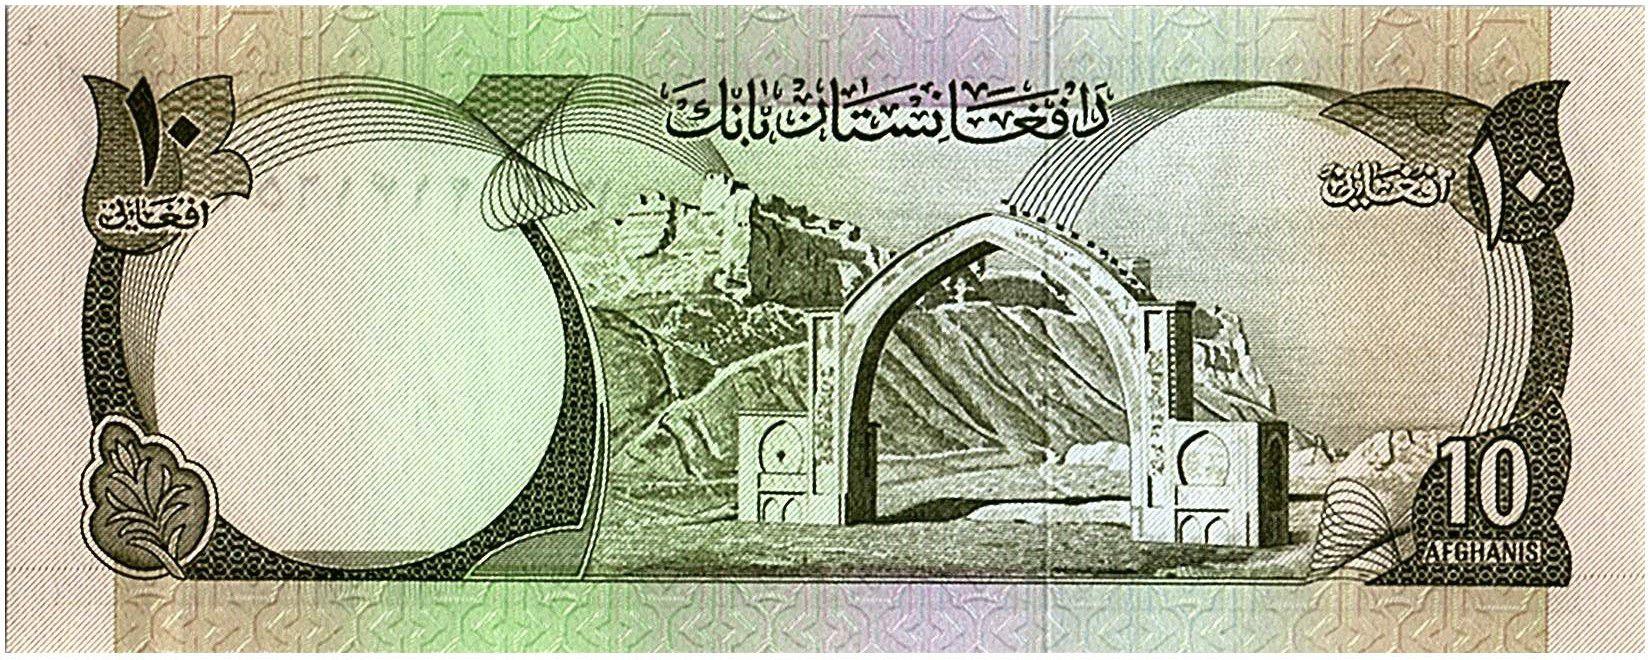 Afghanistan 10 Afghanis Prés. Muhammad Daud - Arche - 1973